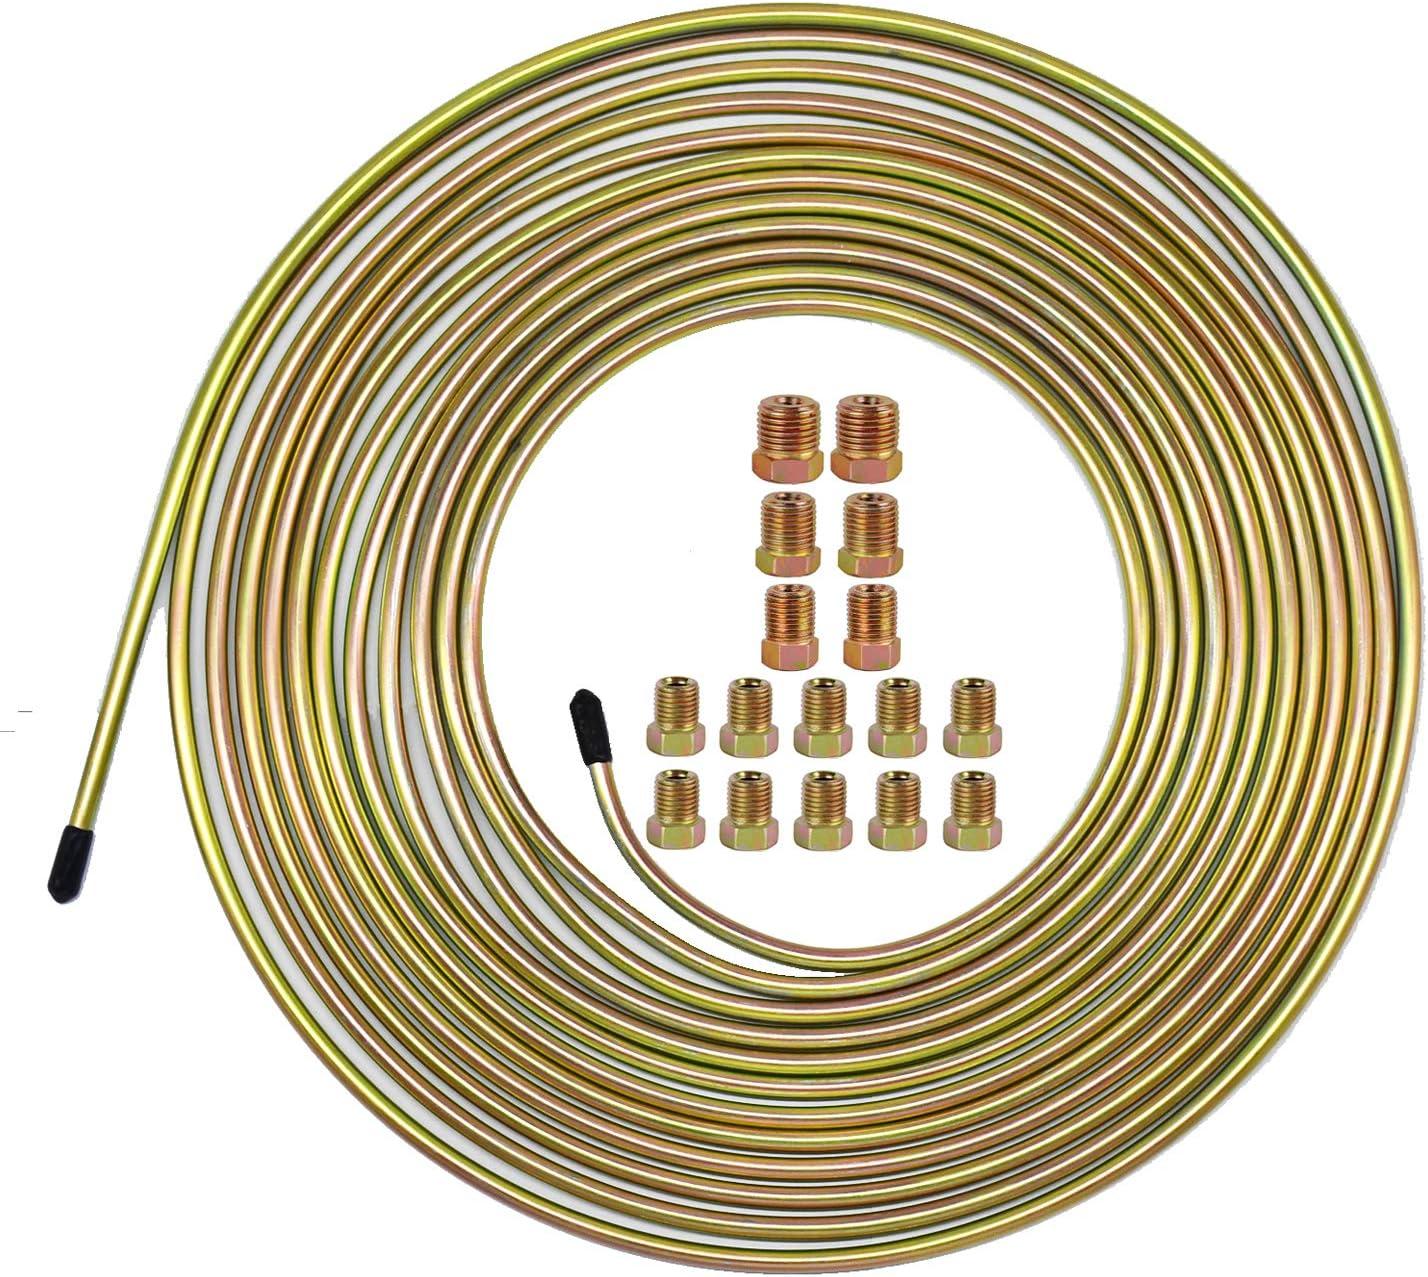 "25 Ft. of 3/16 Brake Line Tubing Kit - Muhize Flexible Double Galvanized Steel Tube Roll 25 ft 3/16"" (Includes 16 Fittings)"